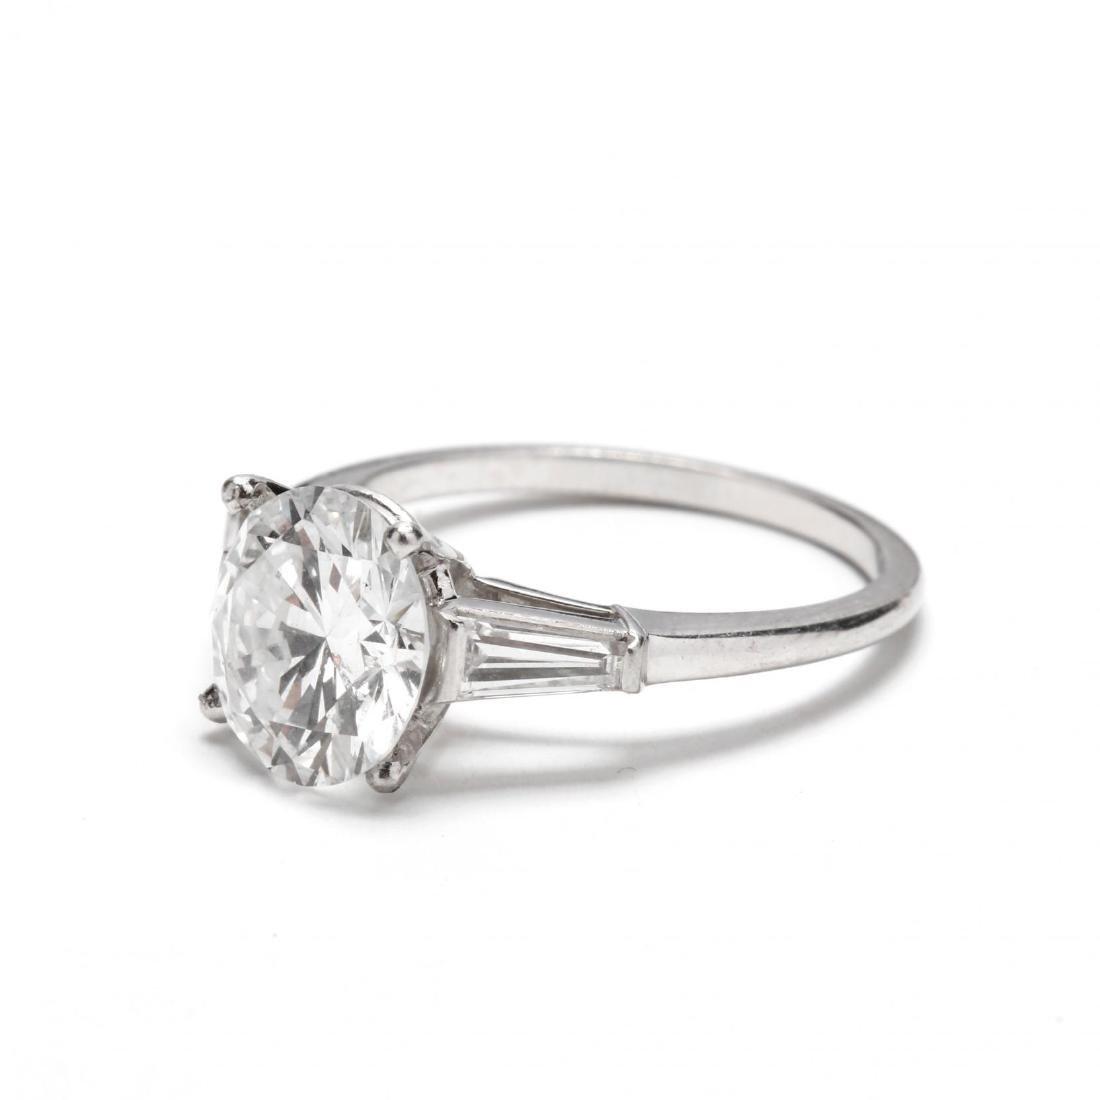 Unmounted Round Brilliant Cut Diamond with Platinum and - 7